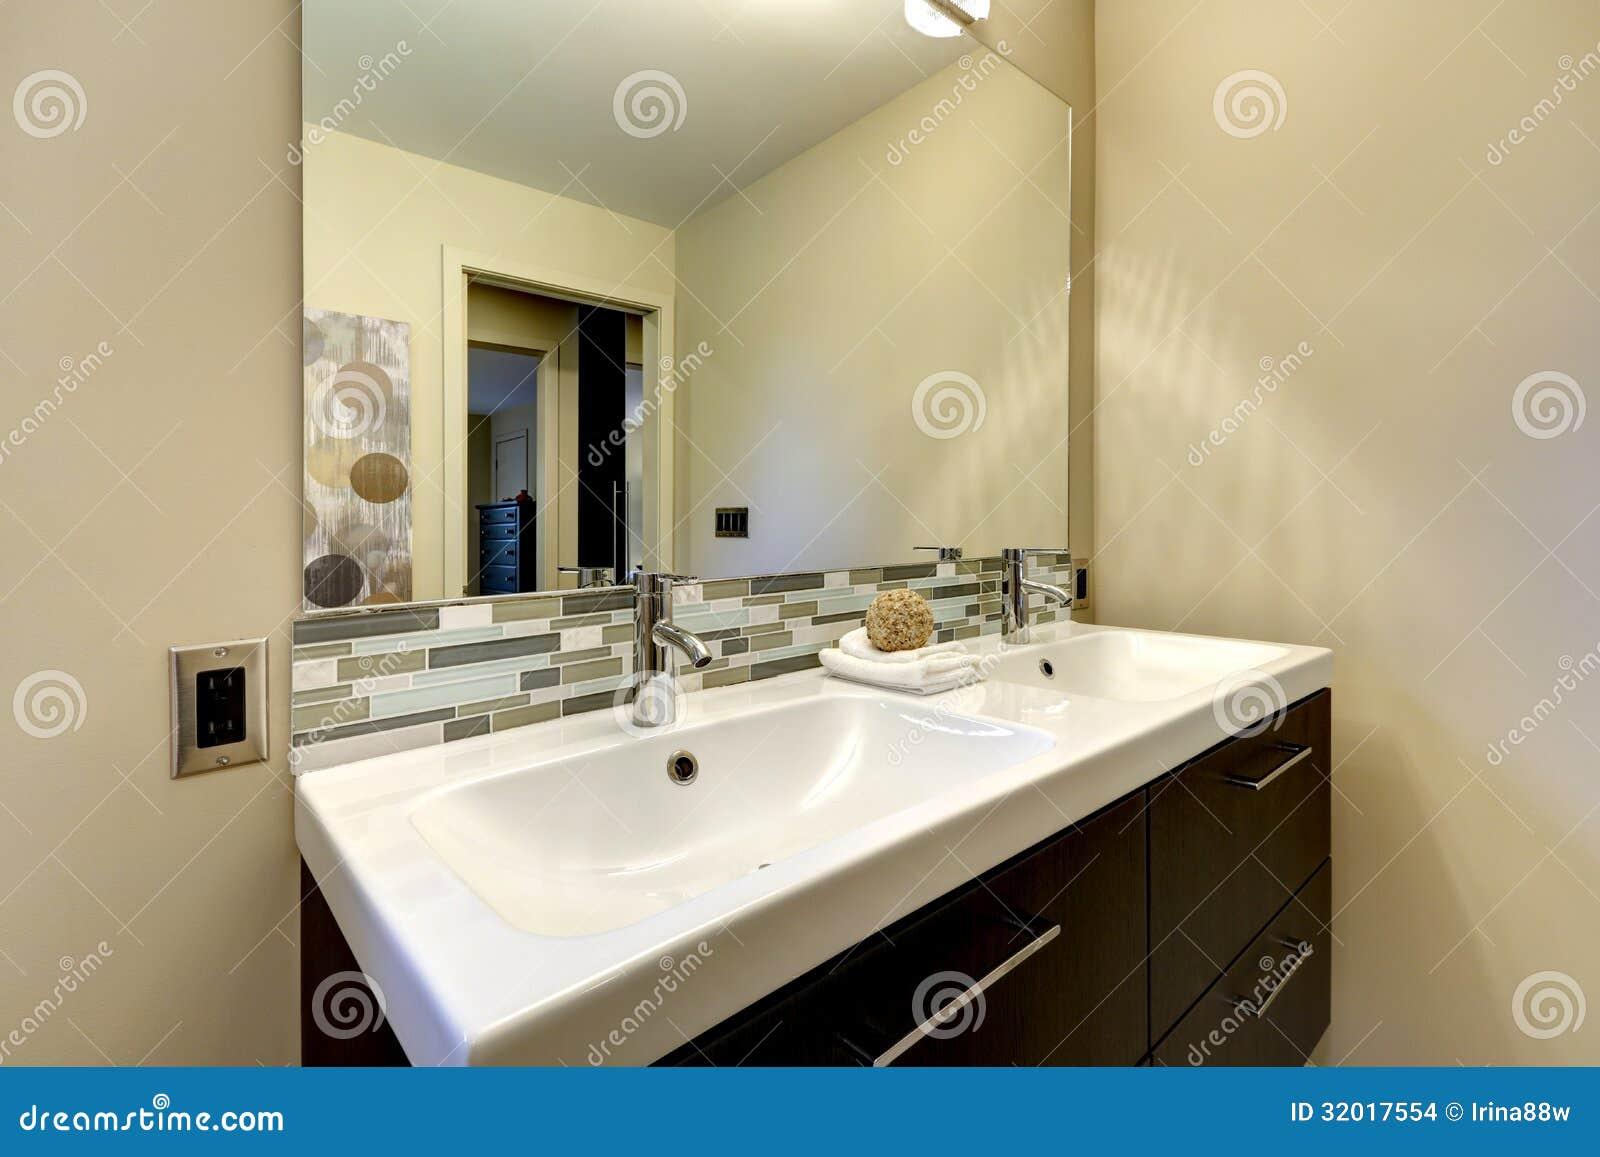 Imagens de Stock: Grande dissipador branco dobro do banheiro moderno  #82A328 1300 957